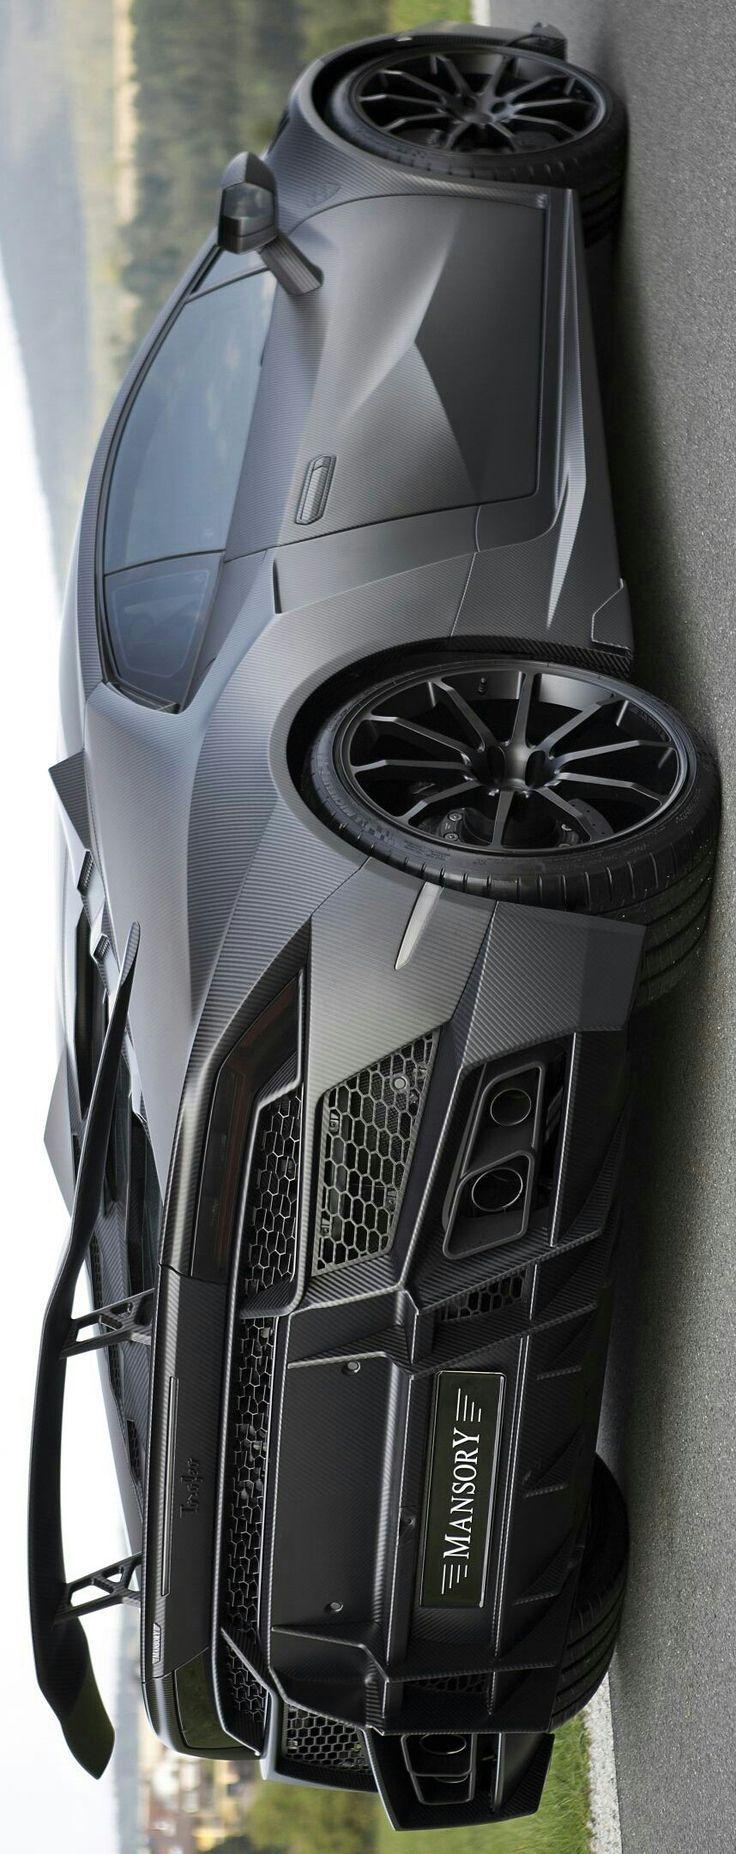 2016 MANSORY TOROFEO Lamborghini Huracan - https://www.luxury.guugles.com/2016-mansory-torofeo-lamborghini-huracan/ (Top 2017)